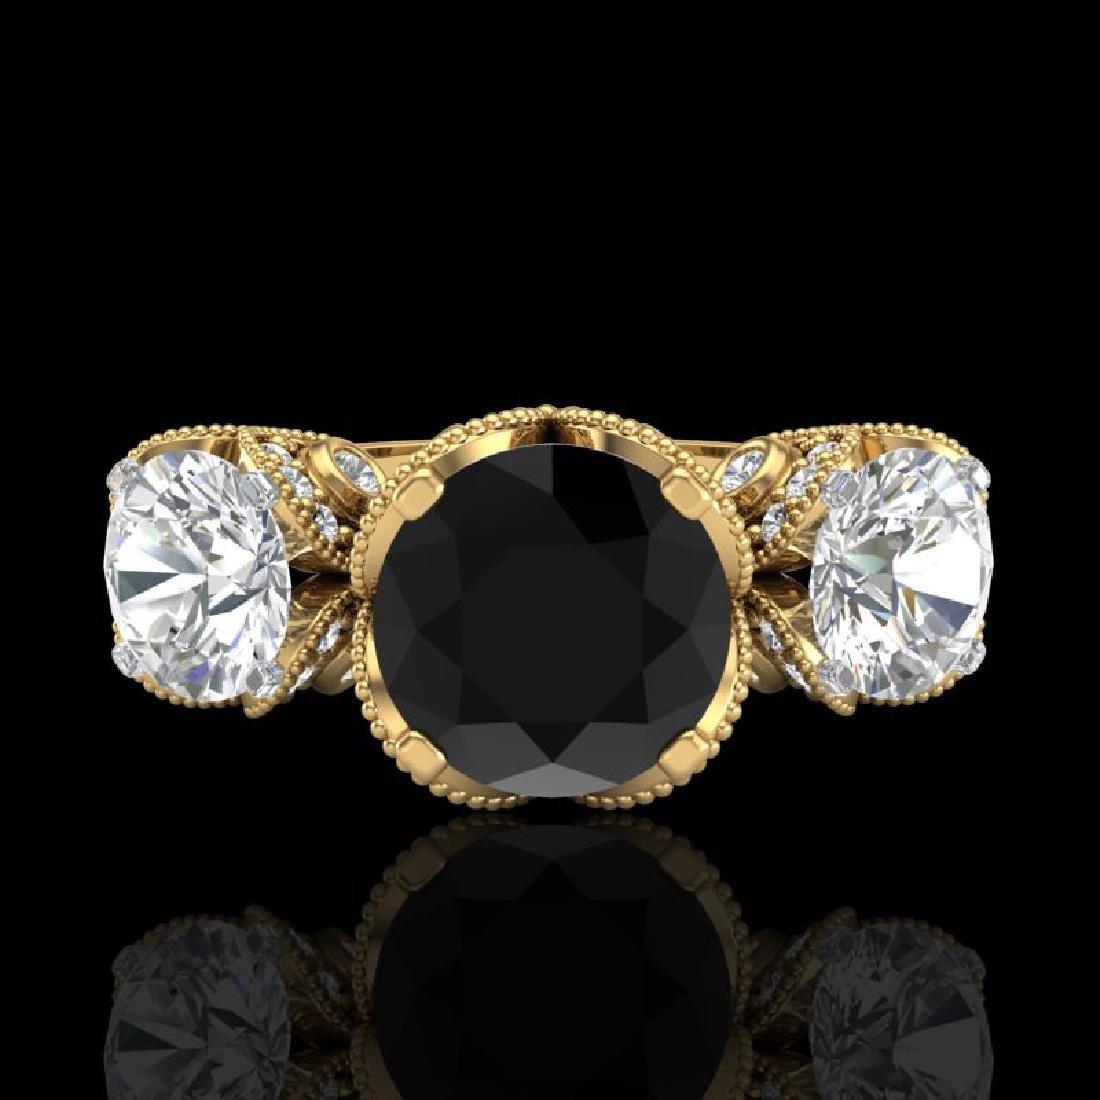 3 CTW Fancy Black Diamond Solitaire Art Deco 3 Stone